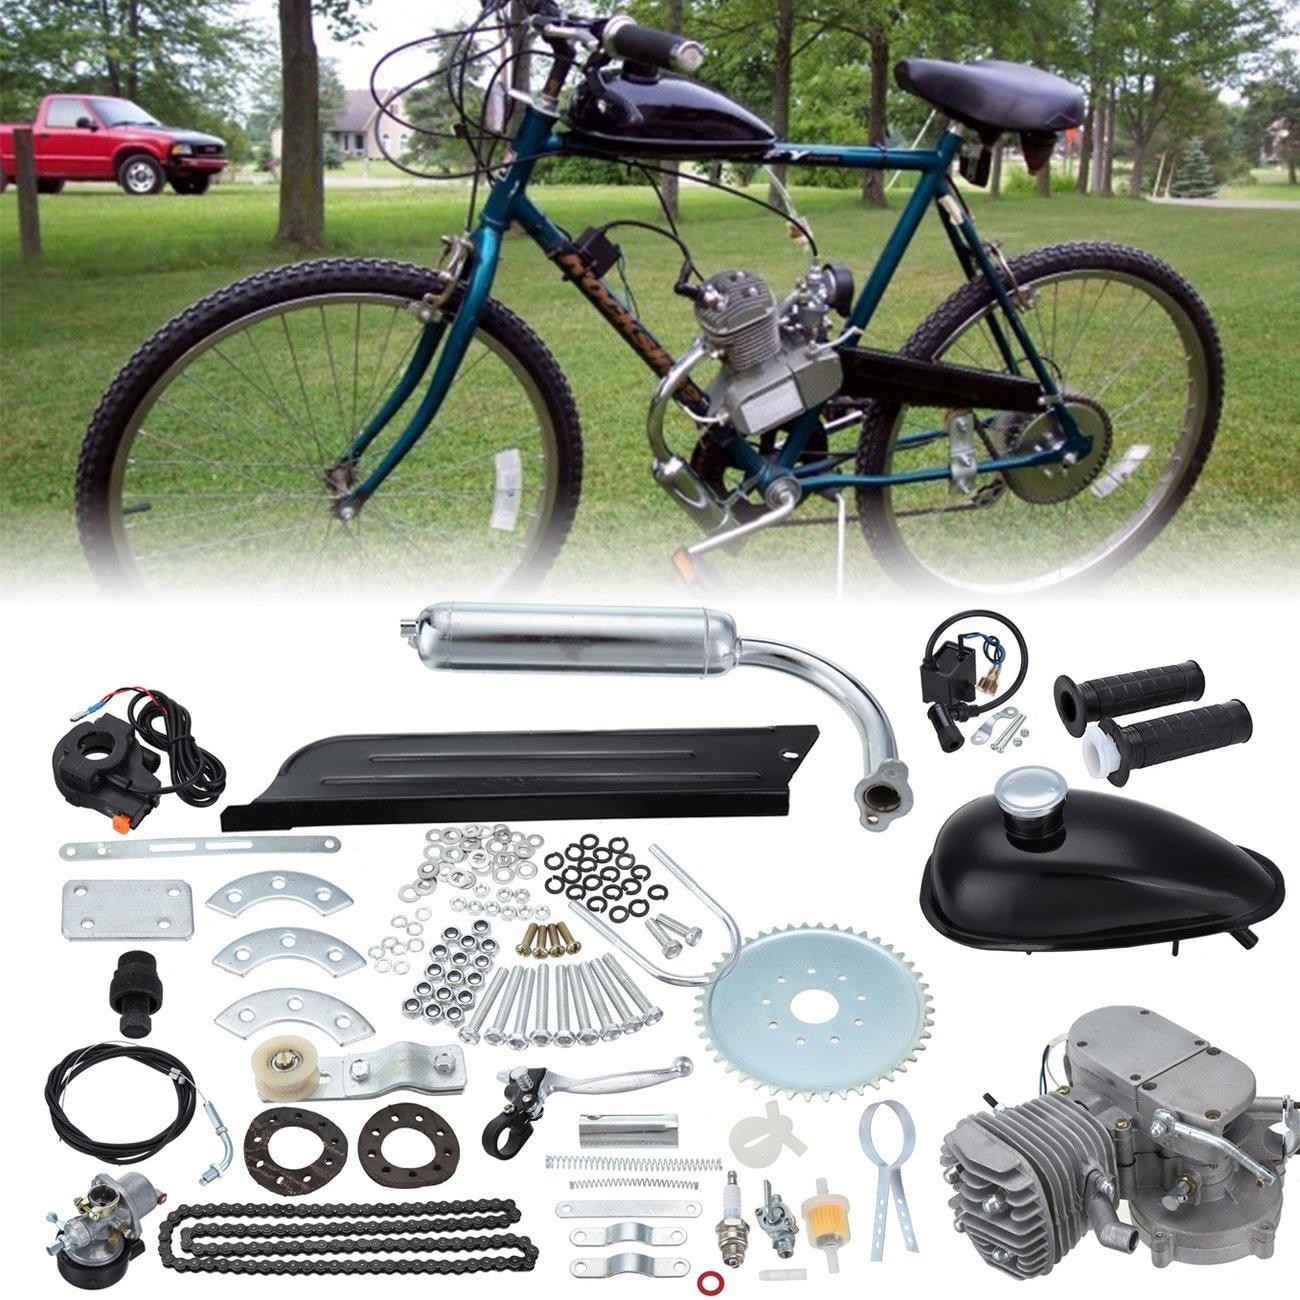 d86562f276f Ambienceo 80cc 2 Stroke Bicycle Engine Kit DIY Motorized Petrol Gasoline Motor  Kit Set For 24